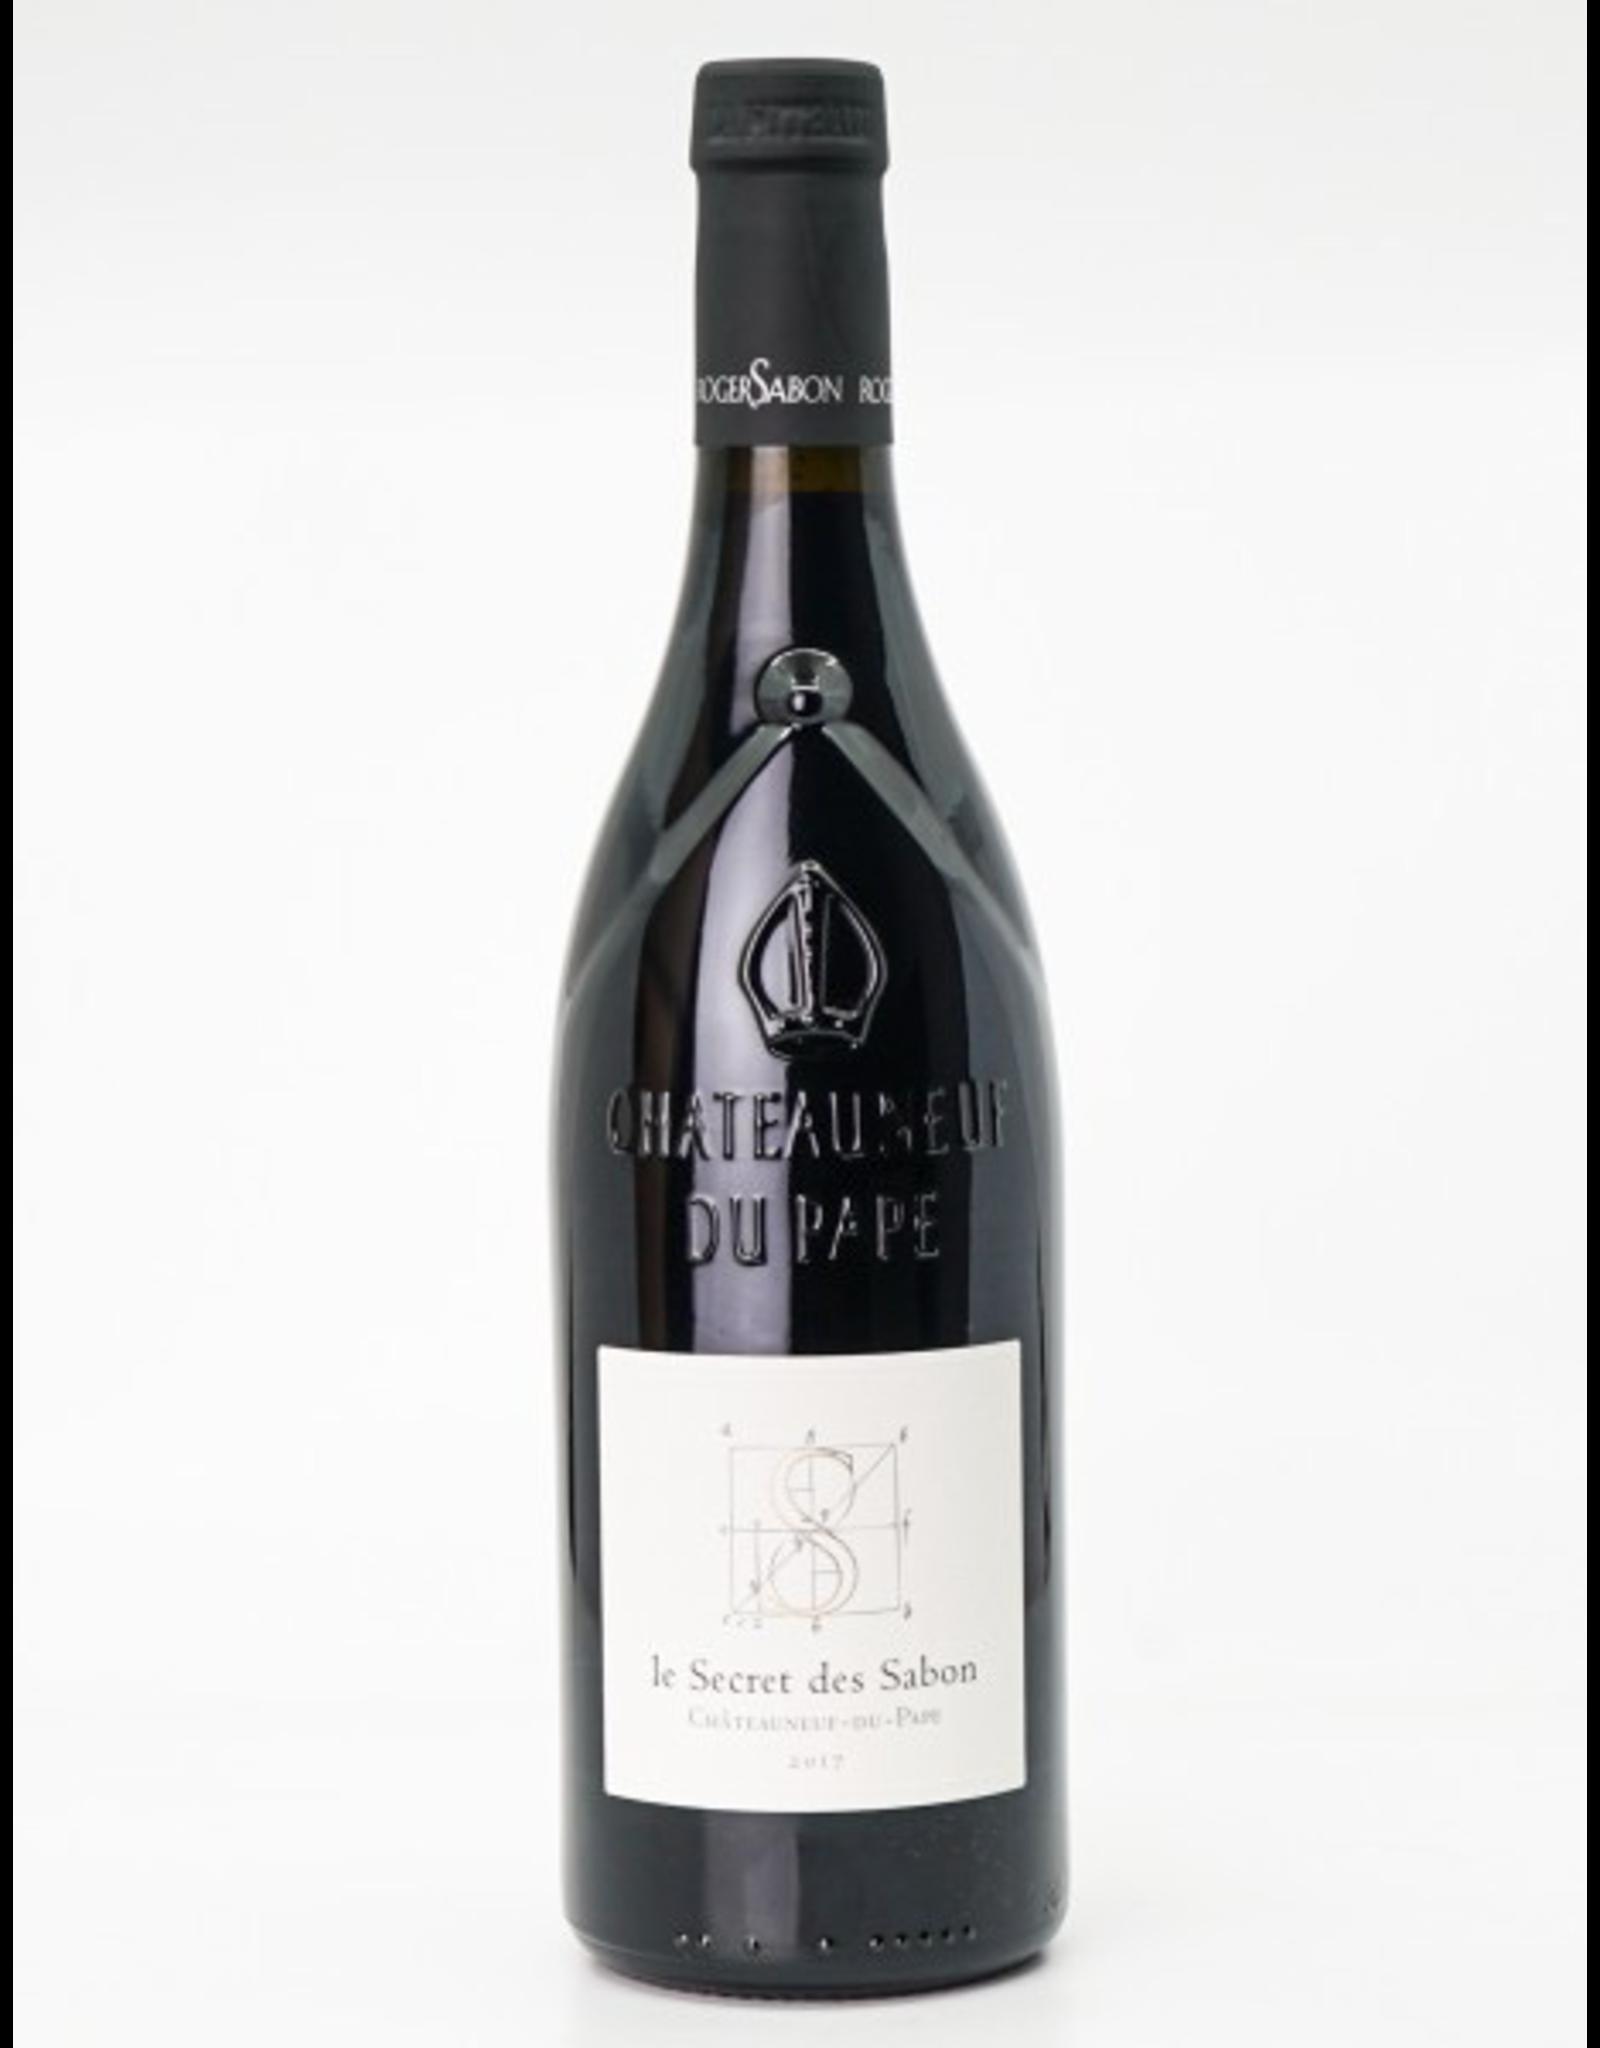 Red Wine 2017, Roger Sabon le Secret des Sabon Chateauneuf-du-Pape, Red Rhone Blend, Chateauneuf-du-Pape, Southern Rhone, France, 15% Alc, CT97 JD99